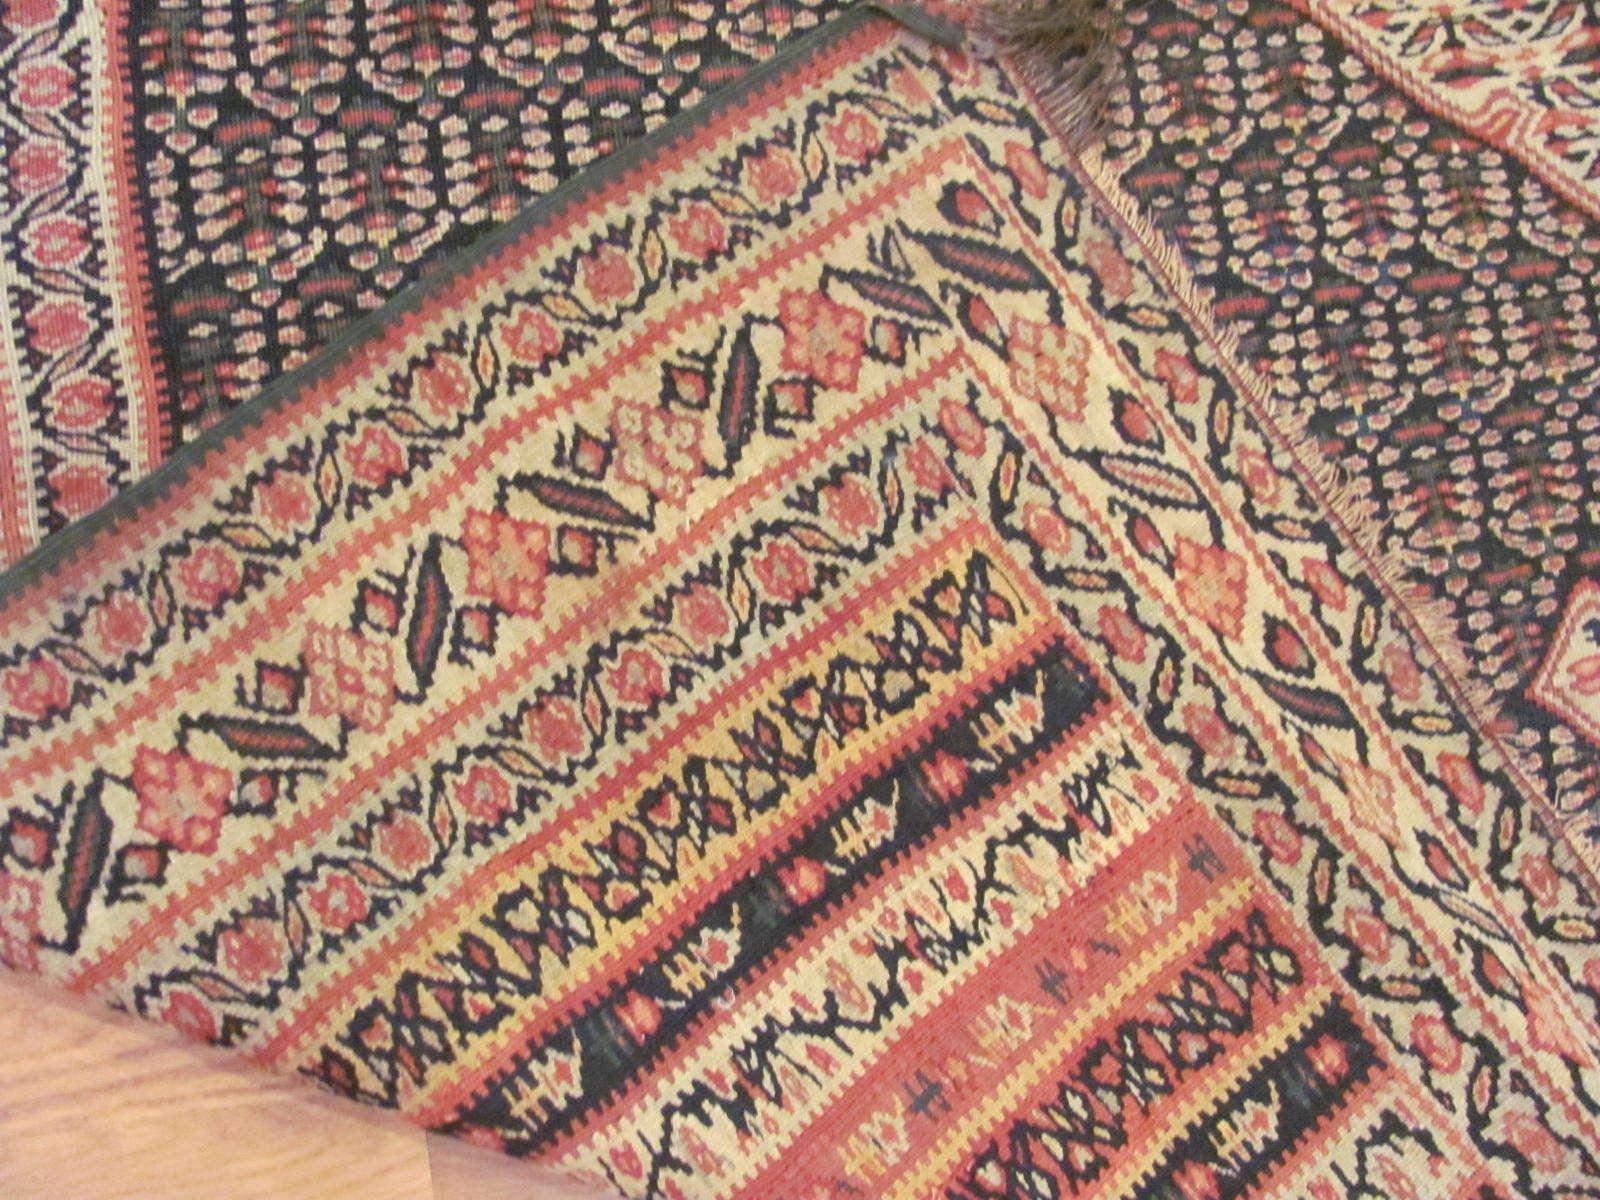 24874 antique persian senneh kilim rug 4,4x6,11-3